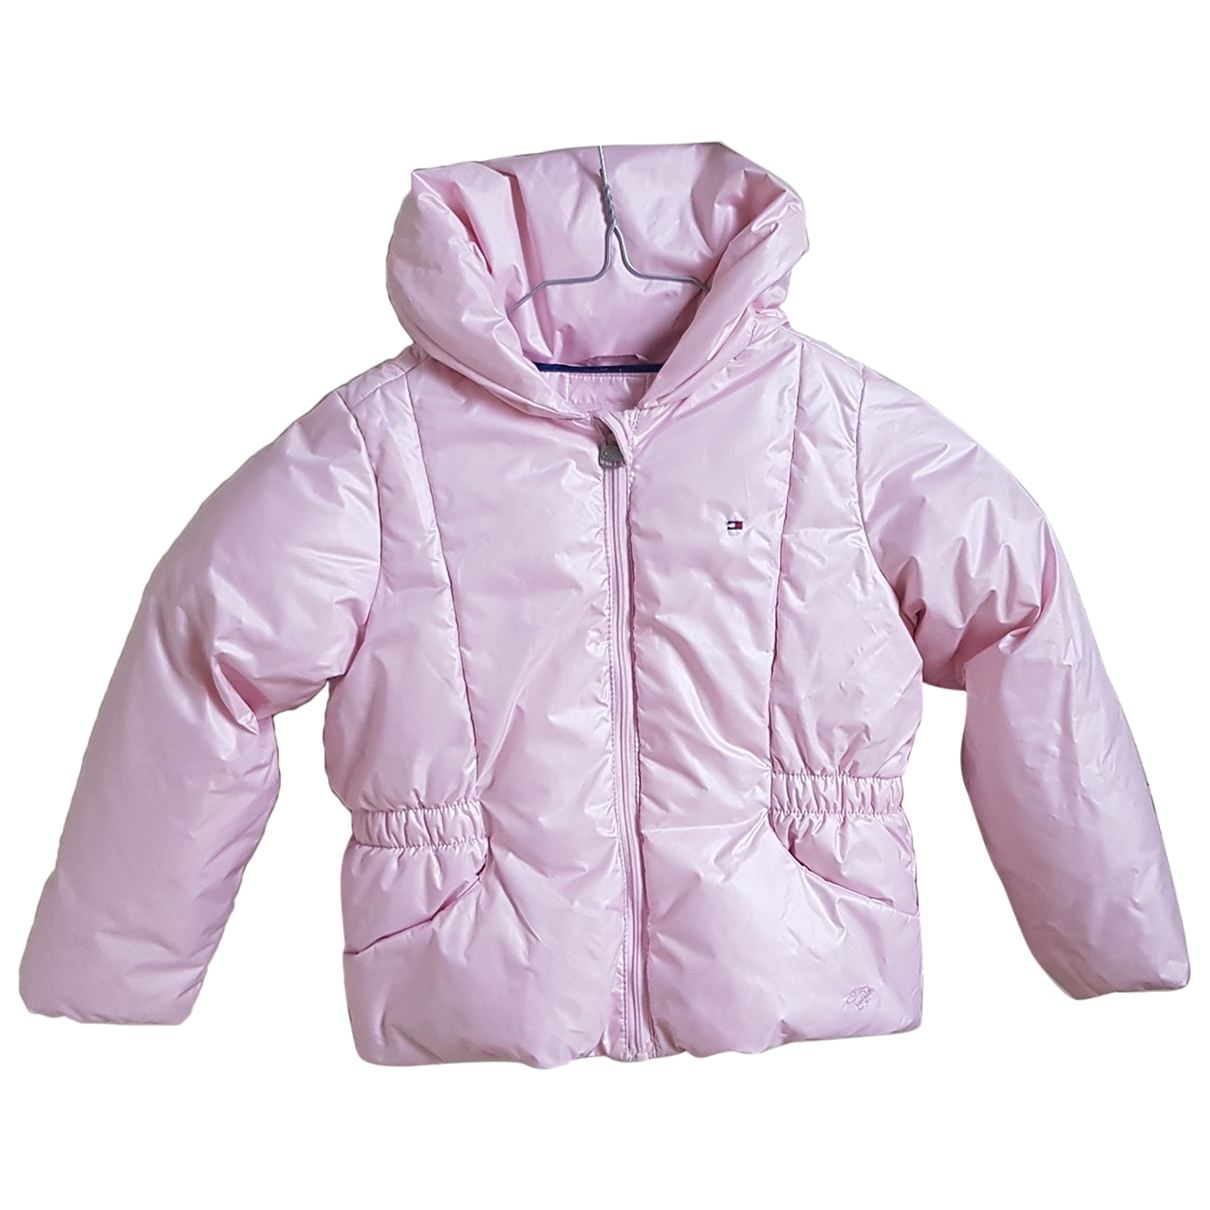 Tommy Hilfiger \N Pink jacket & coat for Kids 4 years - up to 102cm FR